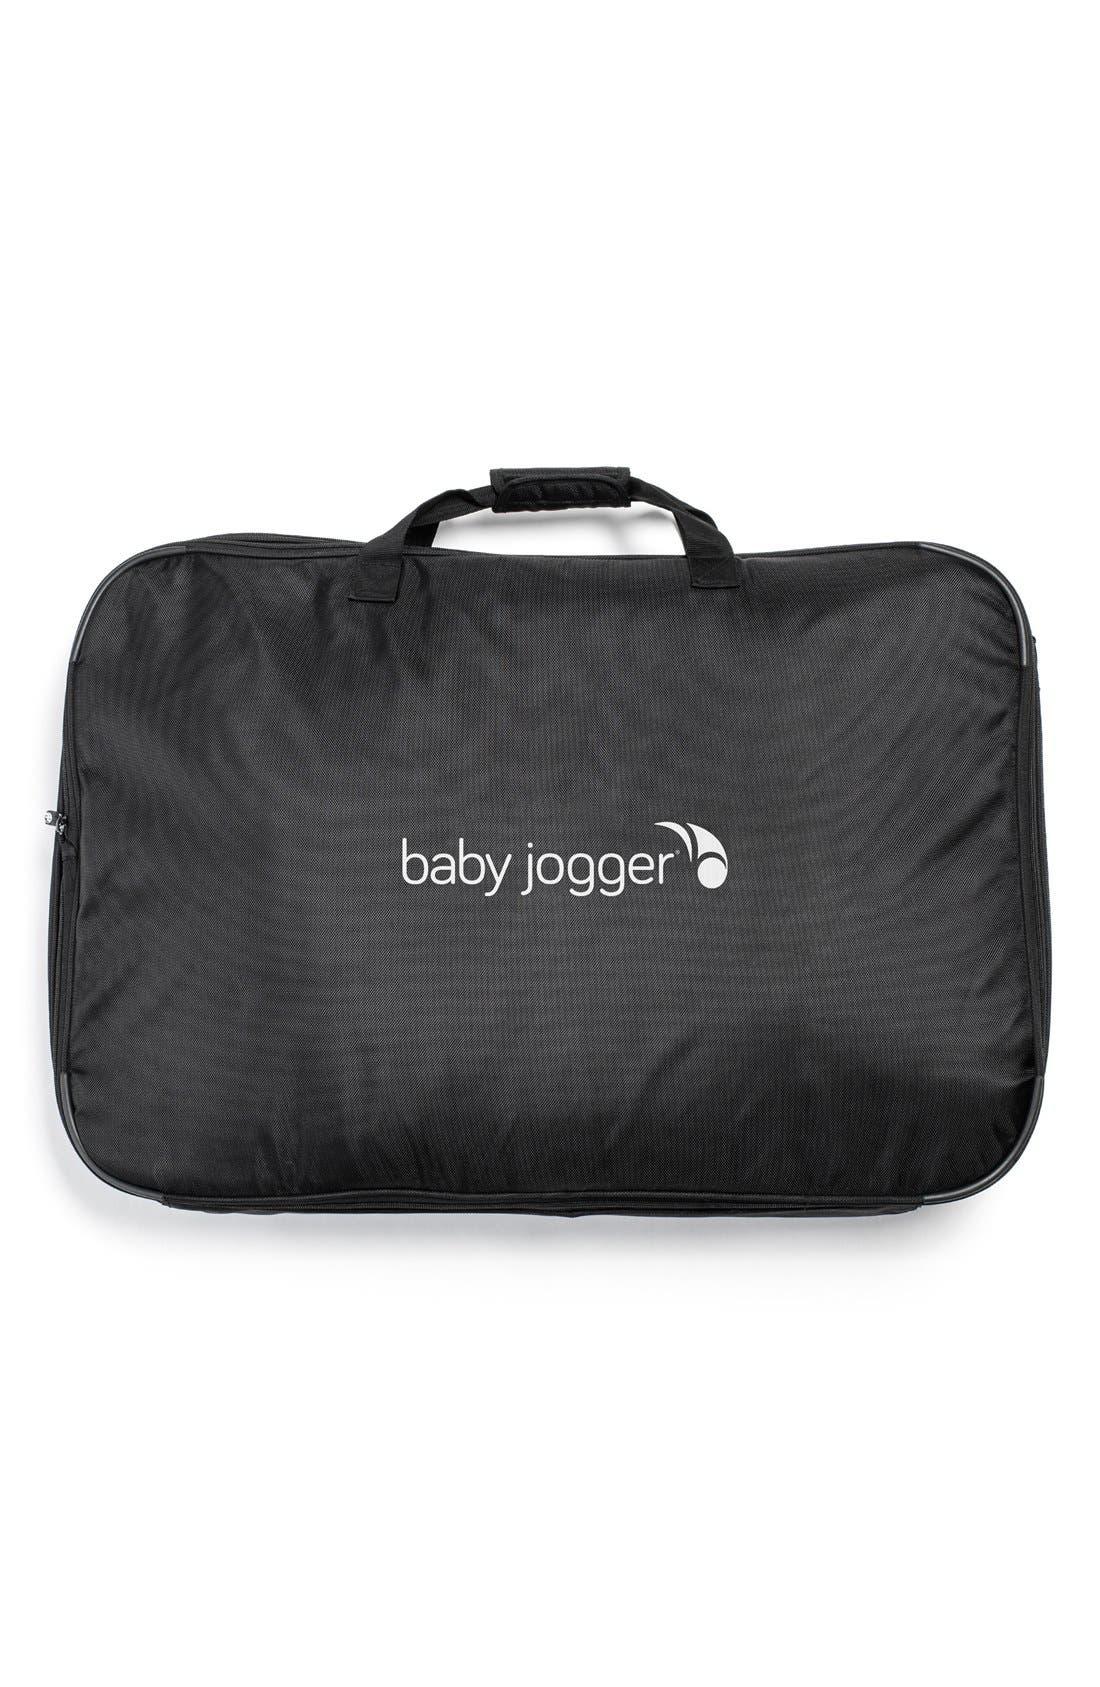 Main Image - Baby Jogger City Mini™ & City Mini GT™ Stroller Carry Bag